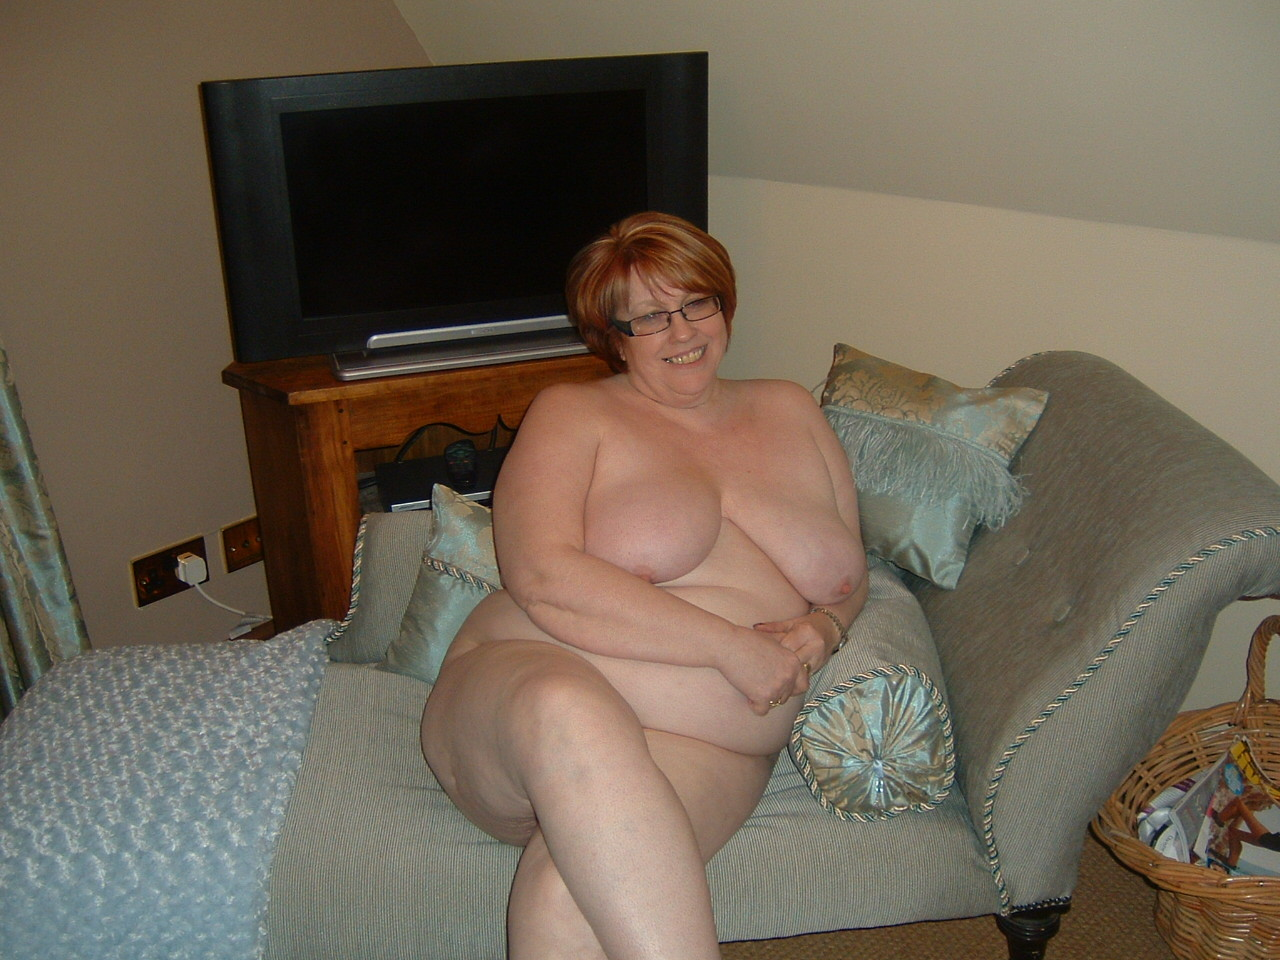 Interracial Milf Bbw - mature natural chubby new porn - MegaPornX